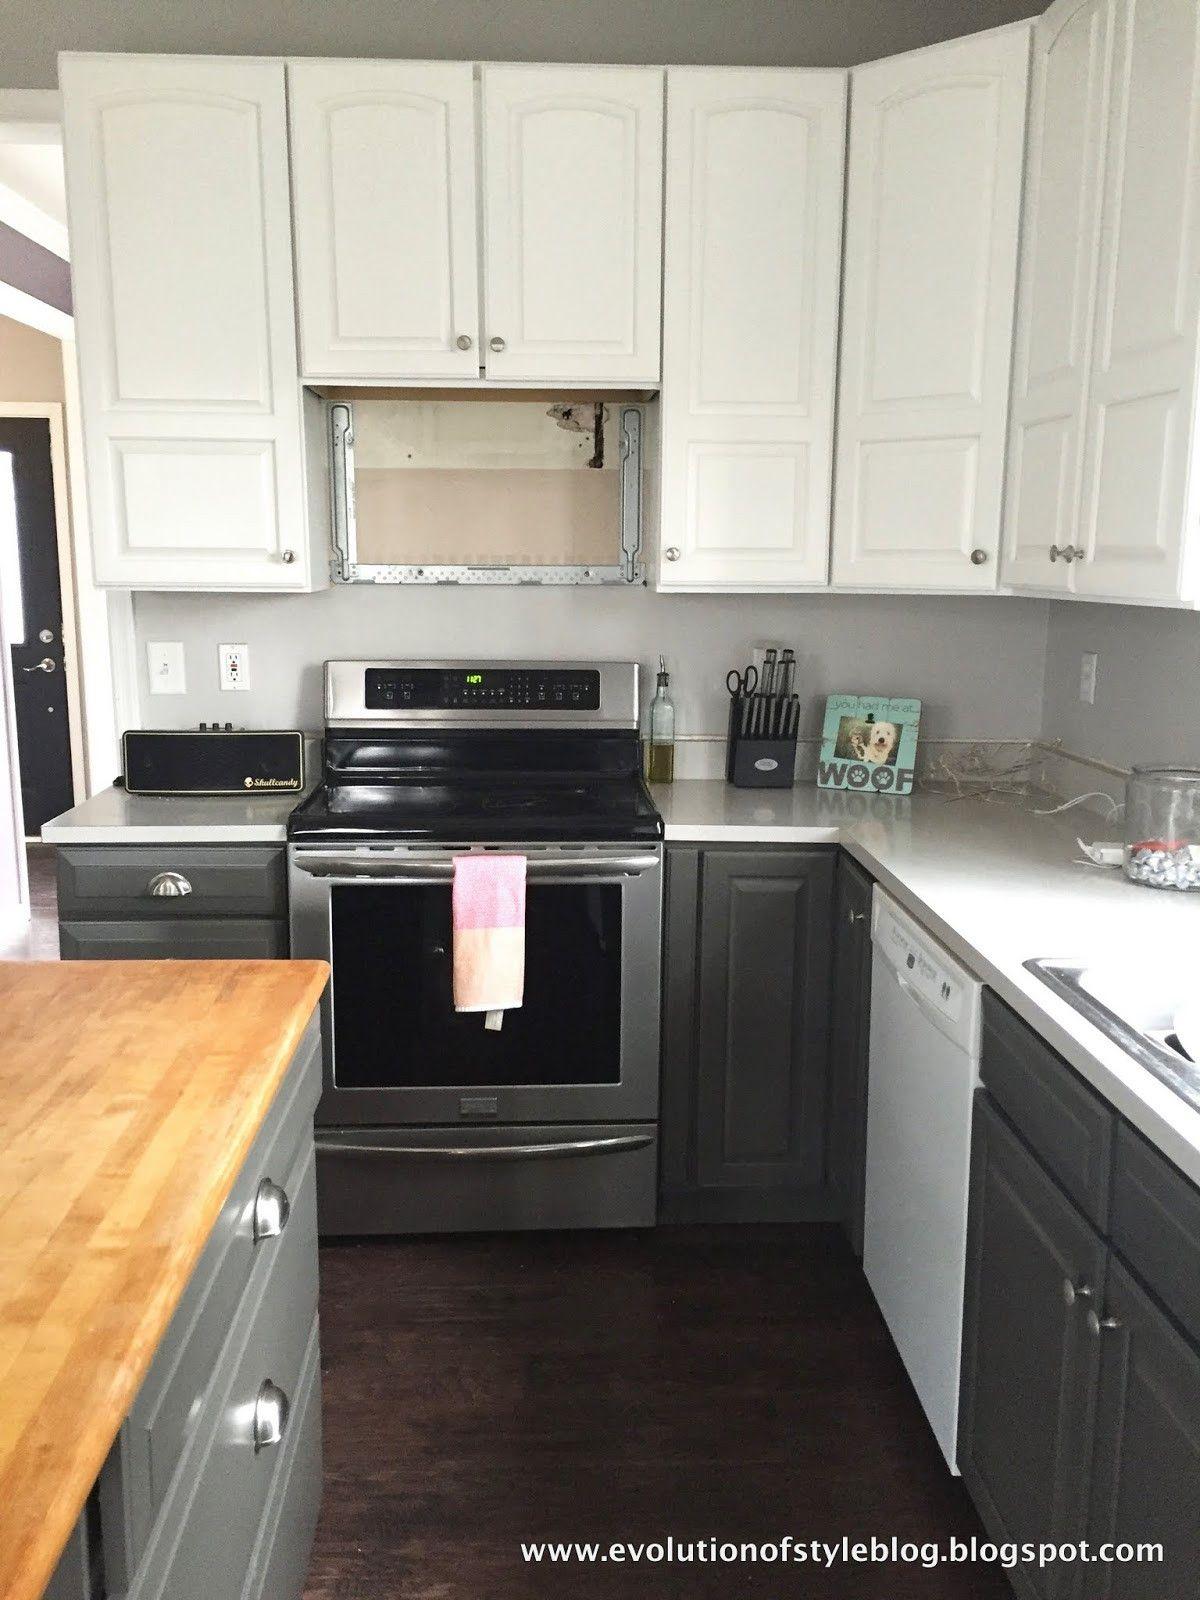 Pin by rahayu on interior analogi in pinterest kitchen